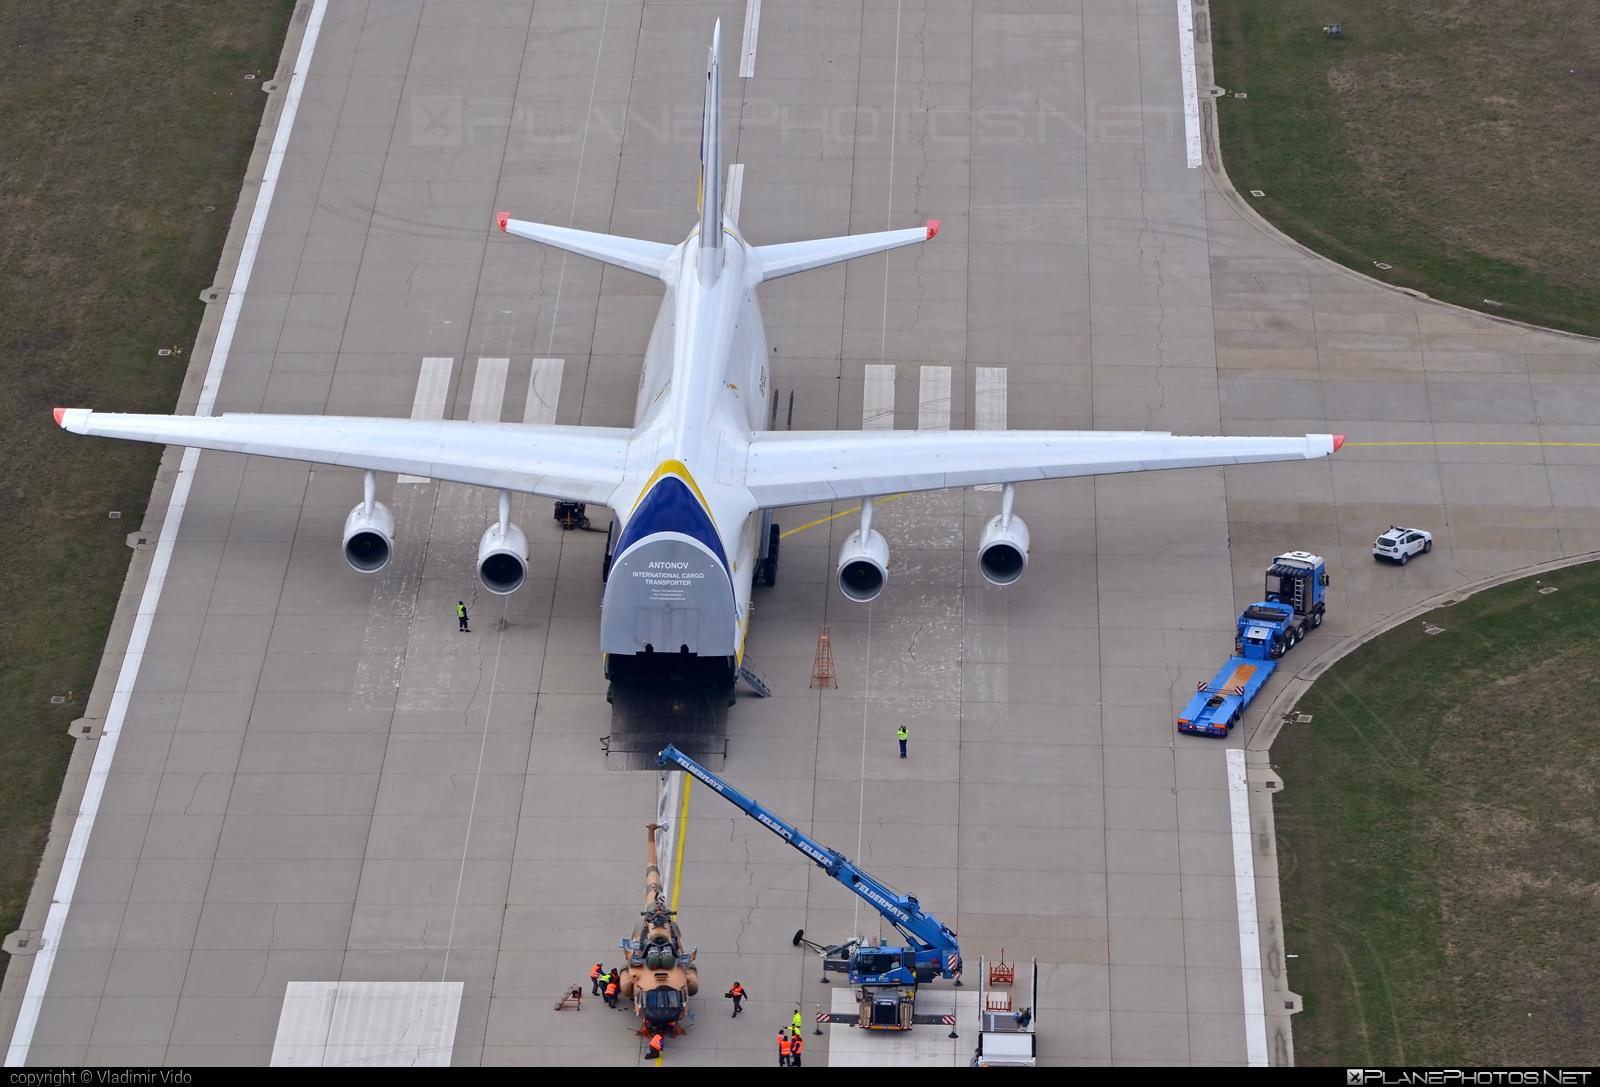 Antonov An-124-100M Ruslan - UR-82027 operated by Antonov Airlines #an124 #an124100m #an124100mruslan #an124ruslan #antonov #antonov124 #antonovan124